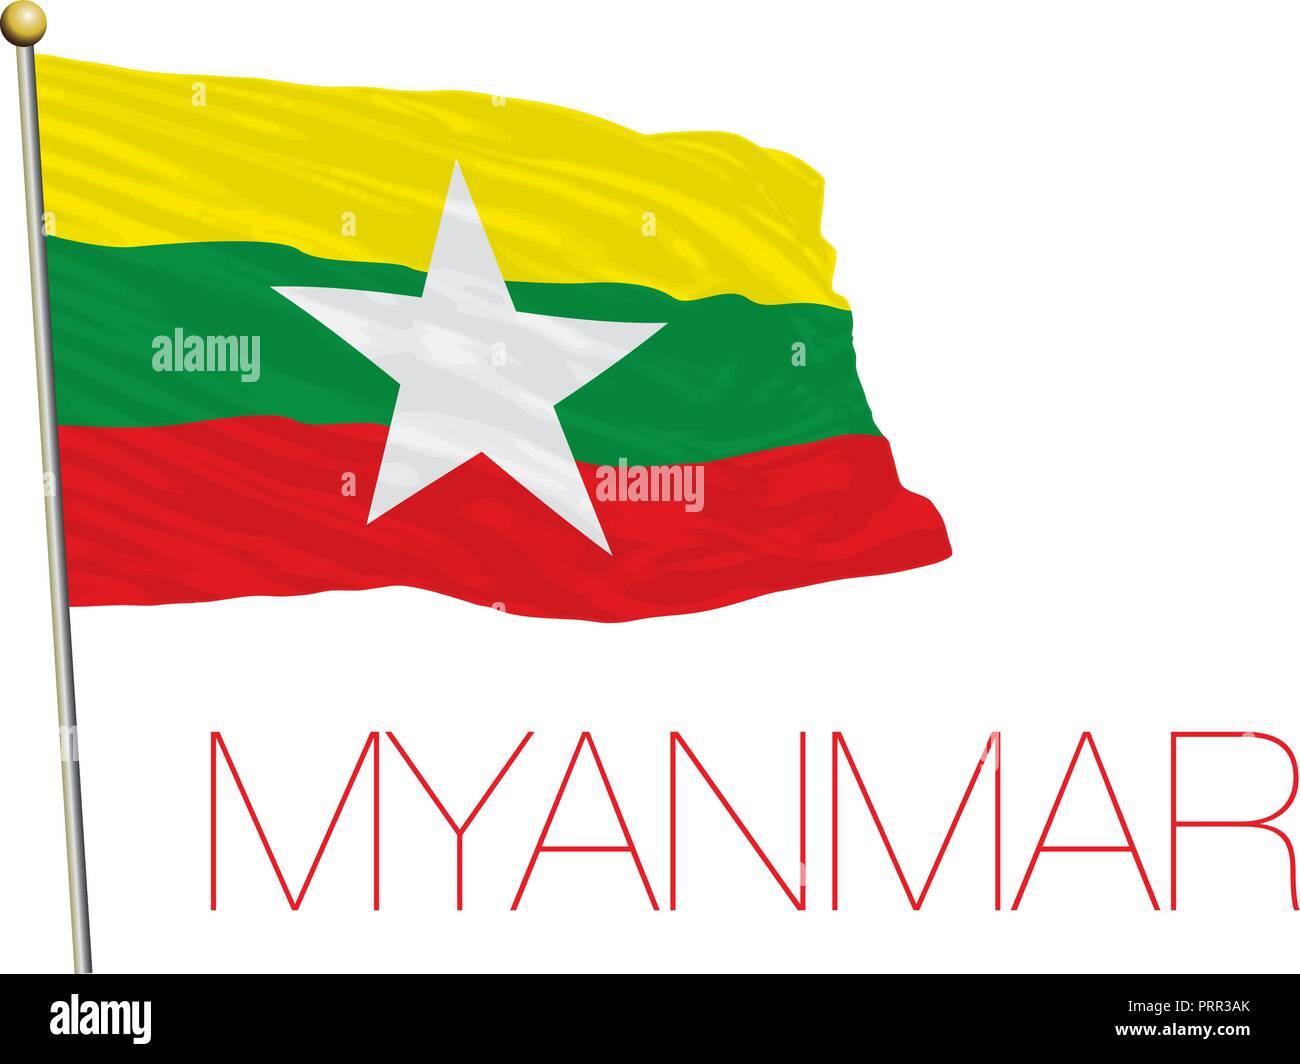 Myanmar official flag, vector illustration - Stock Vector